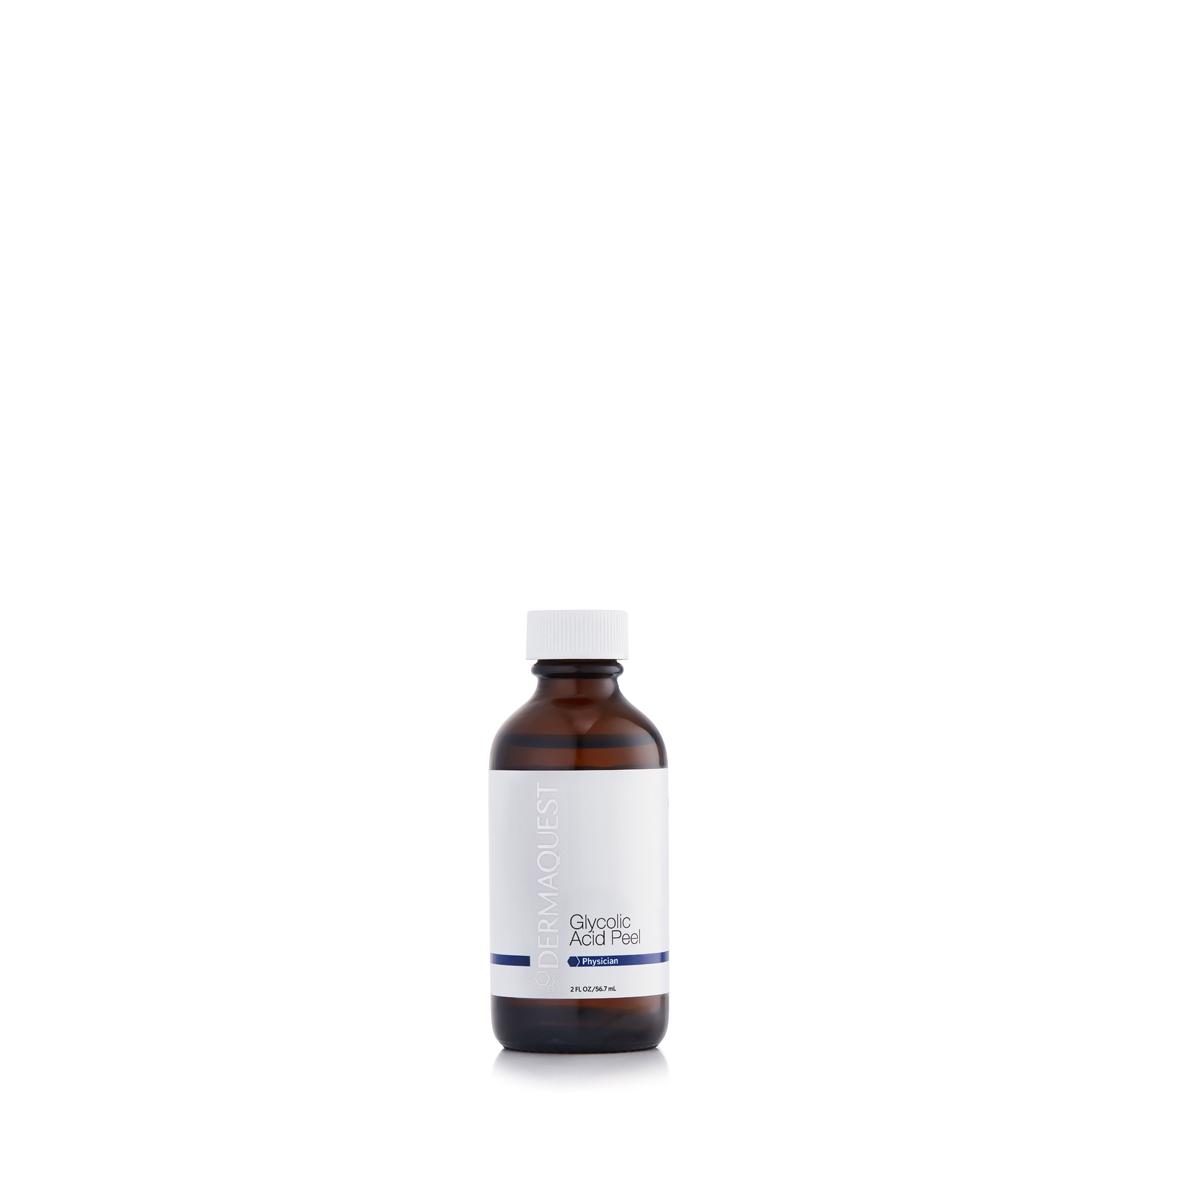 Glycolic Acid Peel – Professional